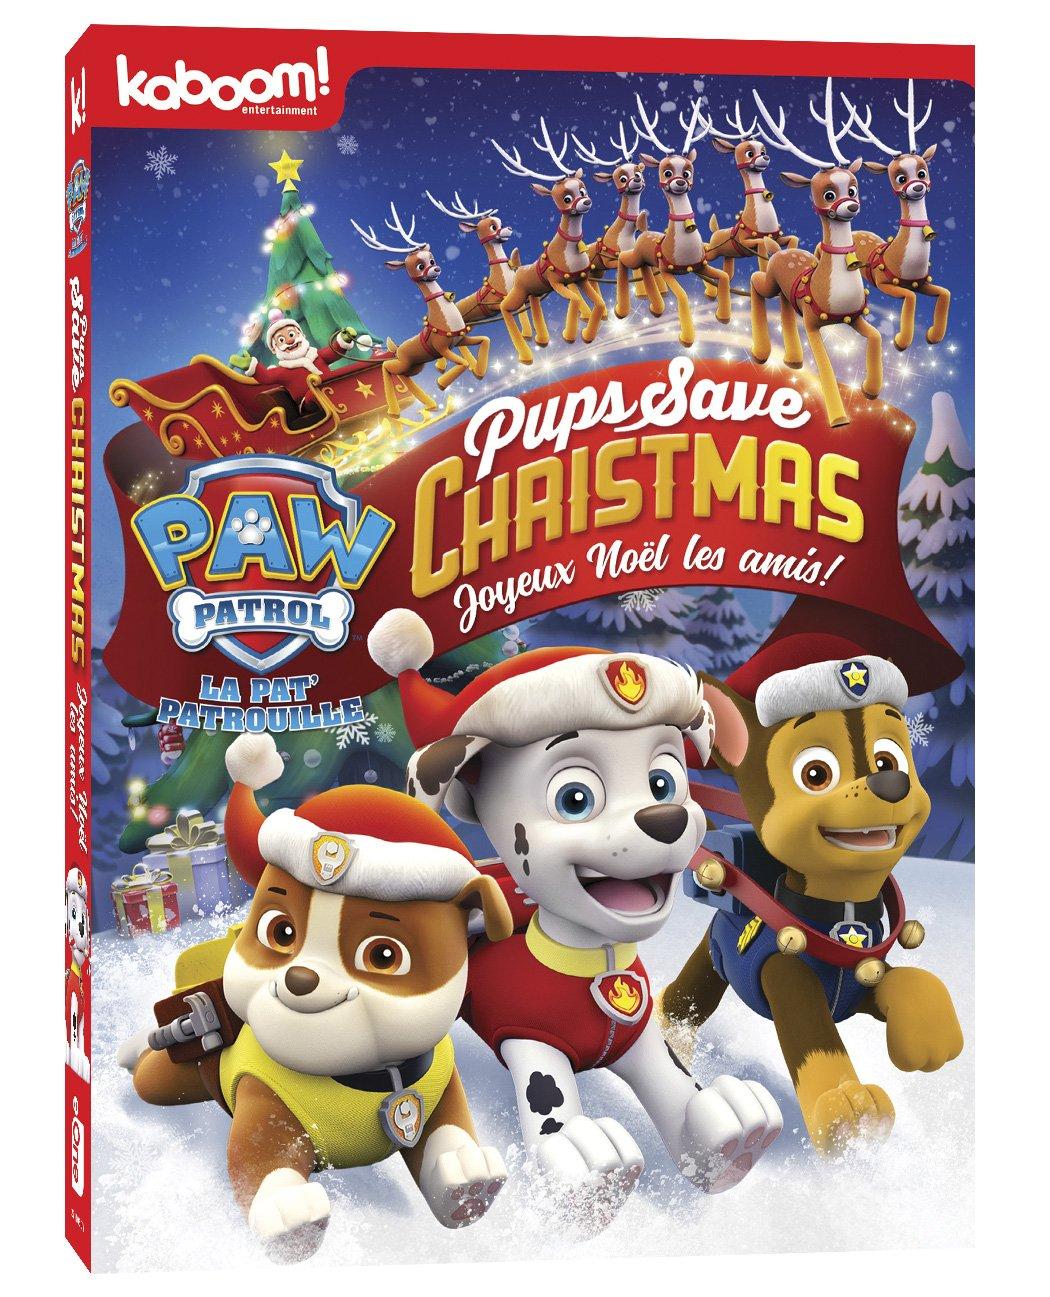 Pups Save Christmas.Paw Patrol Pups Save Christmas Amazon Ca Owen Masondevan